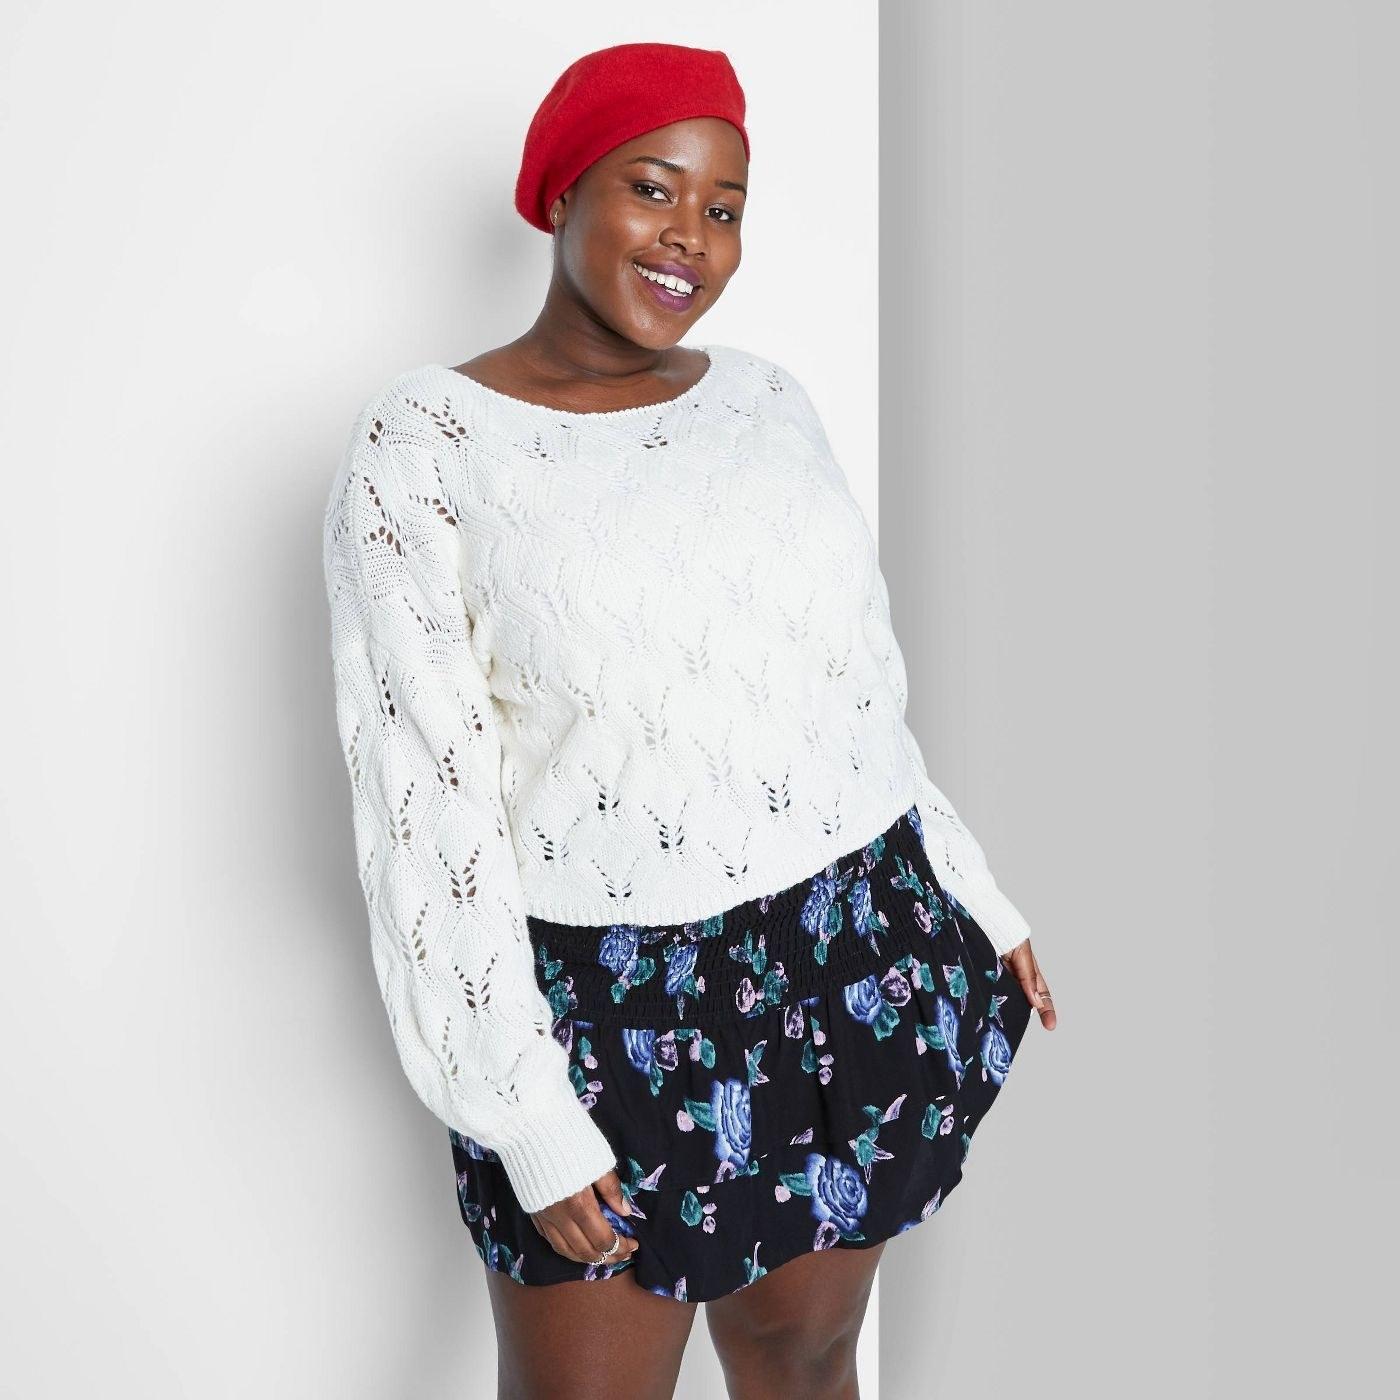 Model wearing the sweater